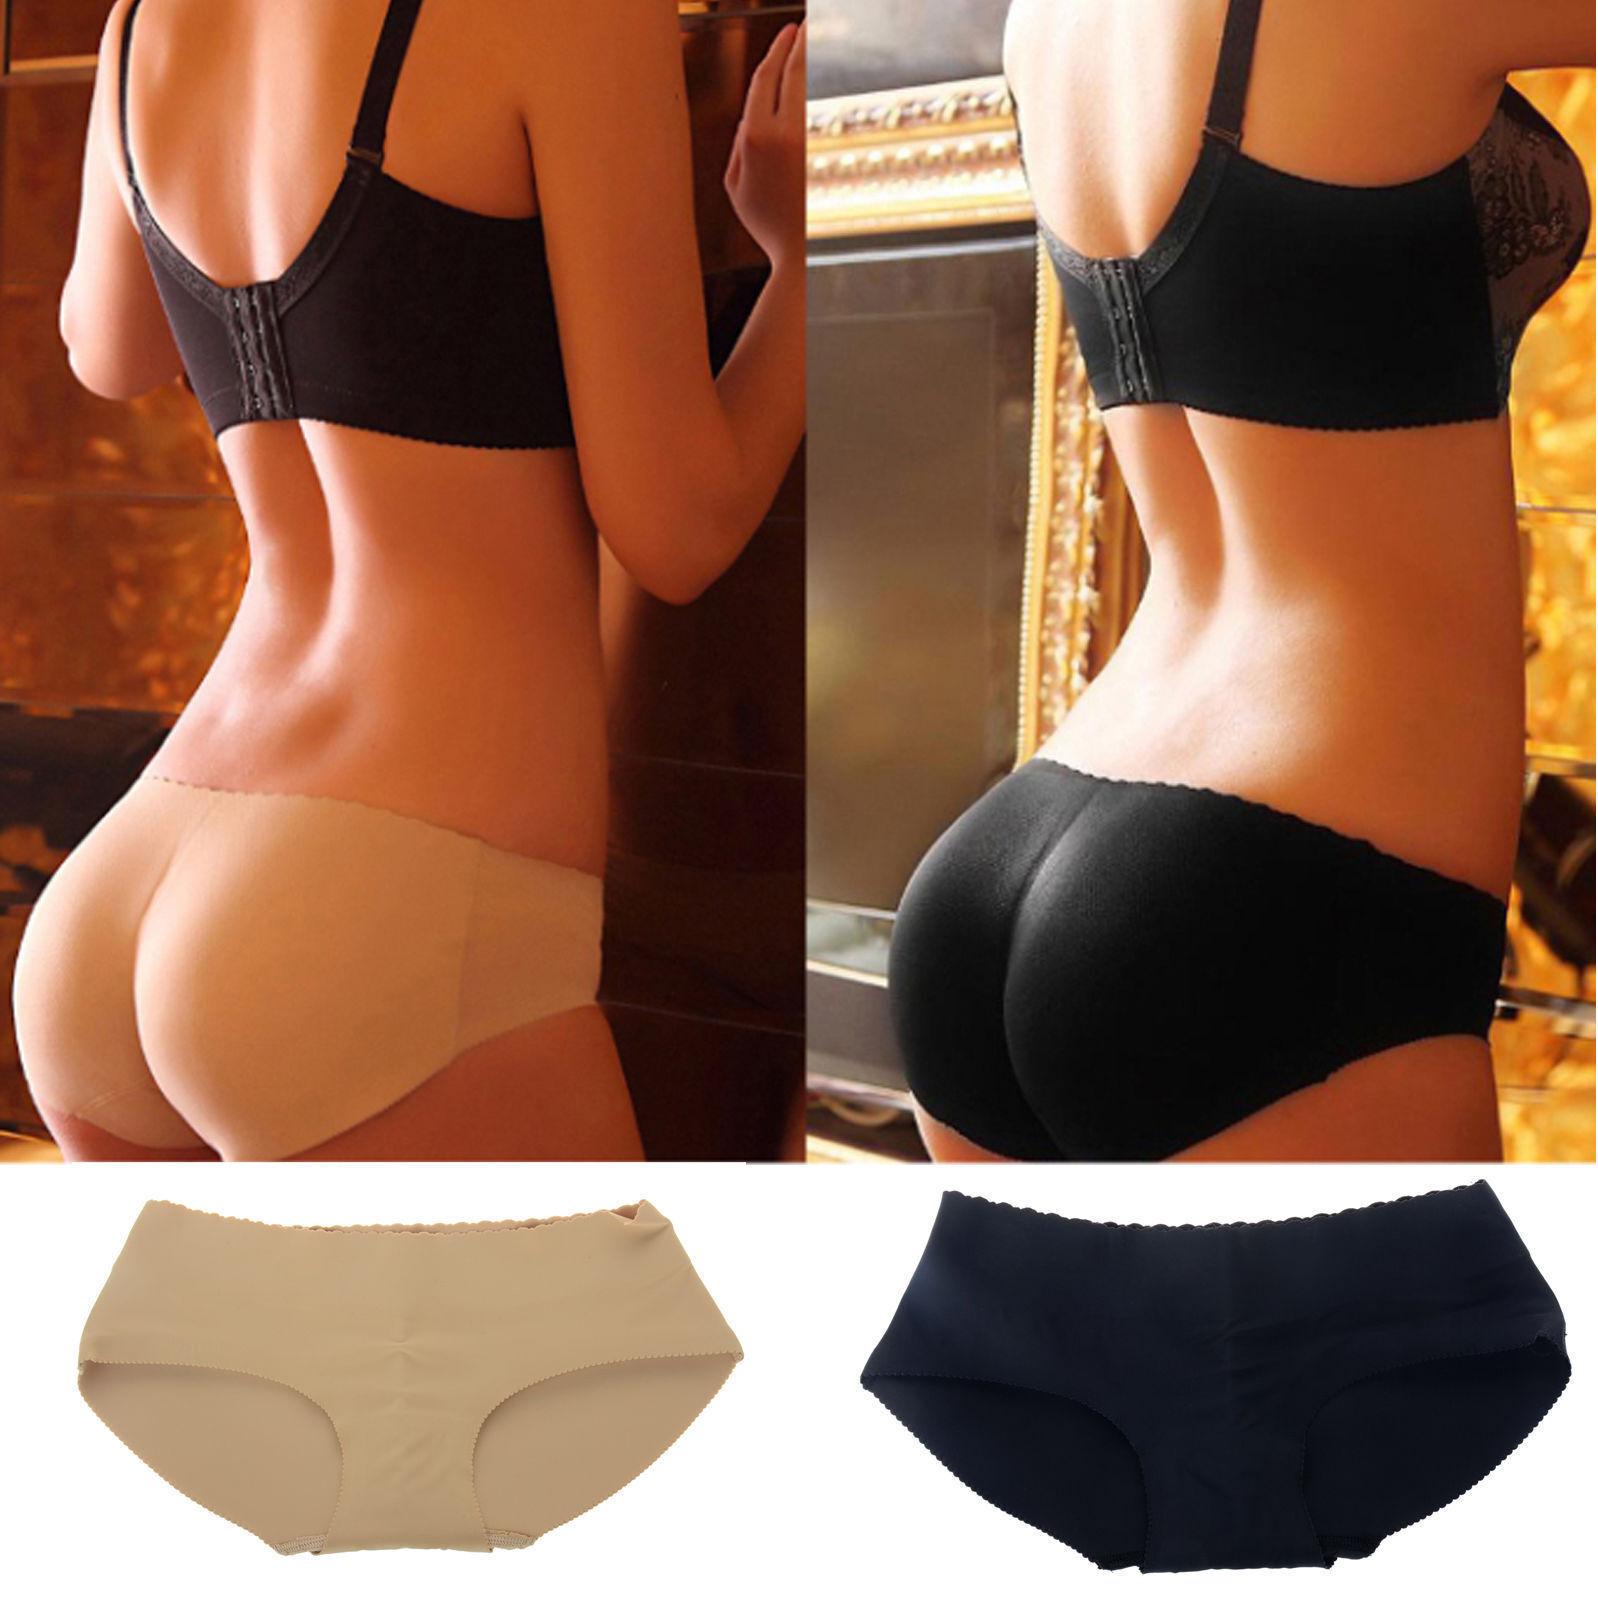 Push Up Slip Panty Mieder Contur Former Hotpants Slips Apfel Po Pants XS S M L